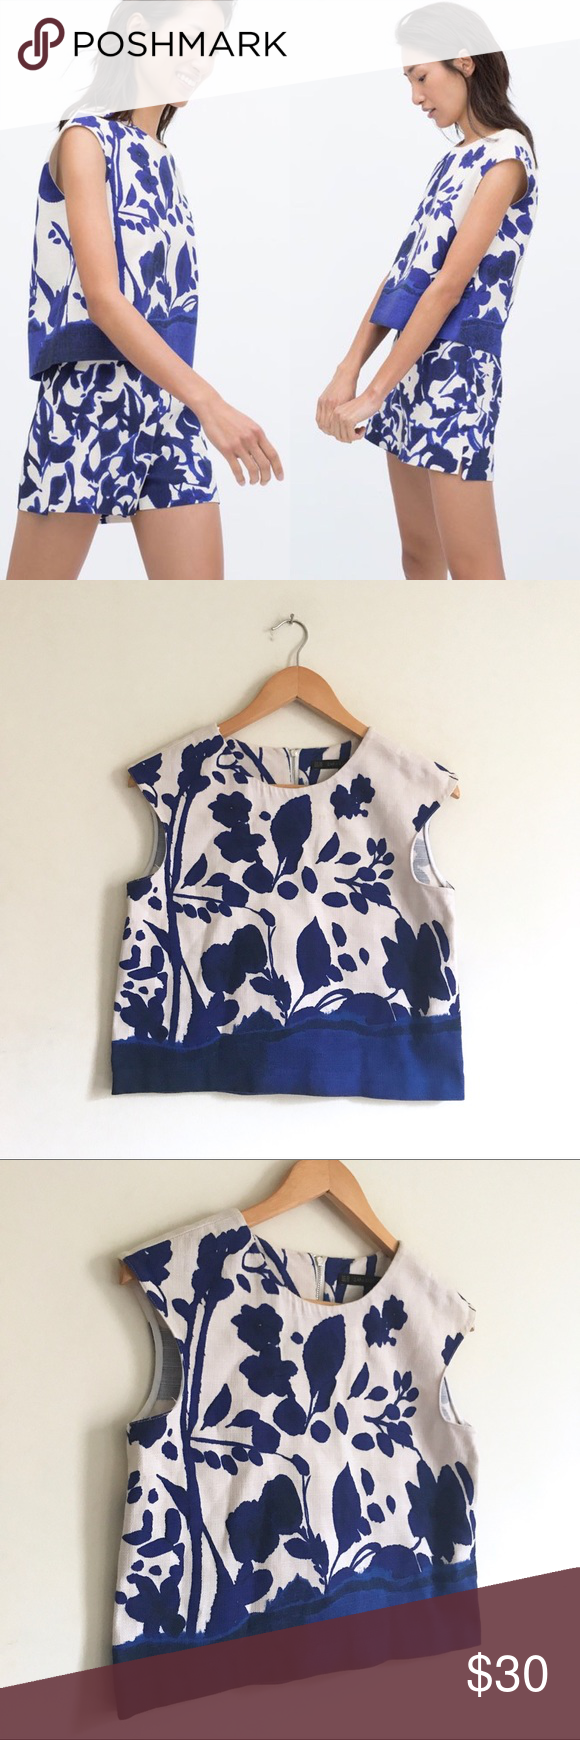 e2c59b924277f0 Zara Basic Blue Printed Structured Crop Top Structured crop top form Zara  Basic. Blue and